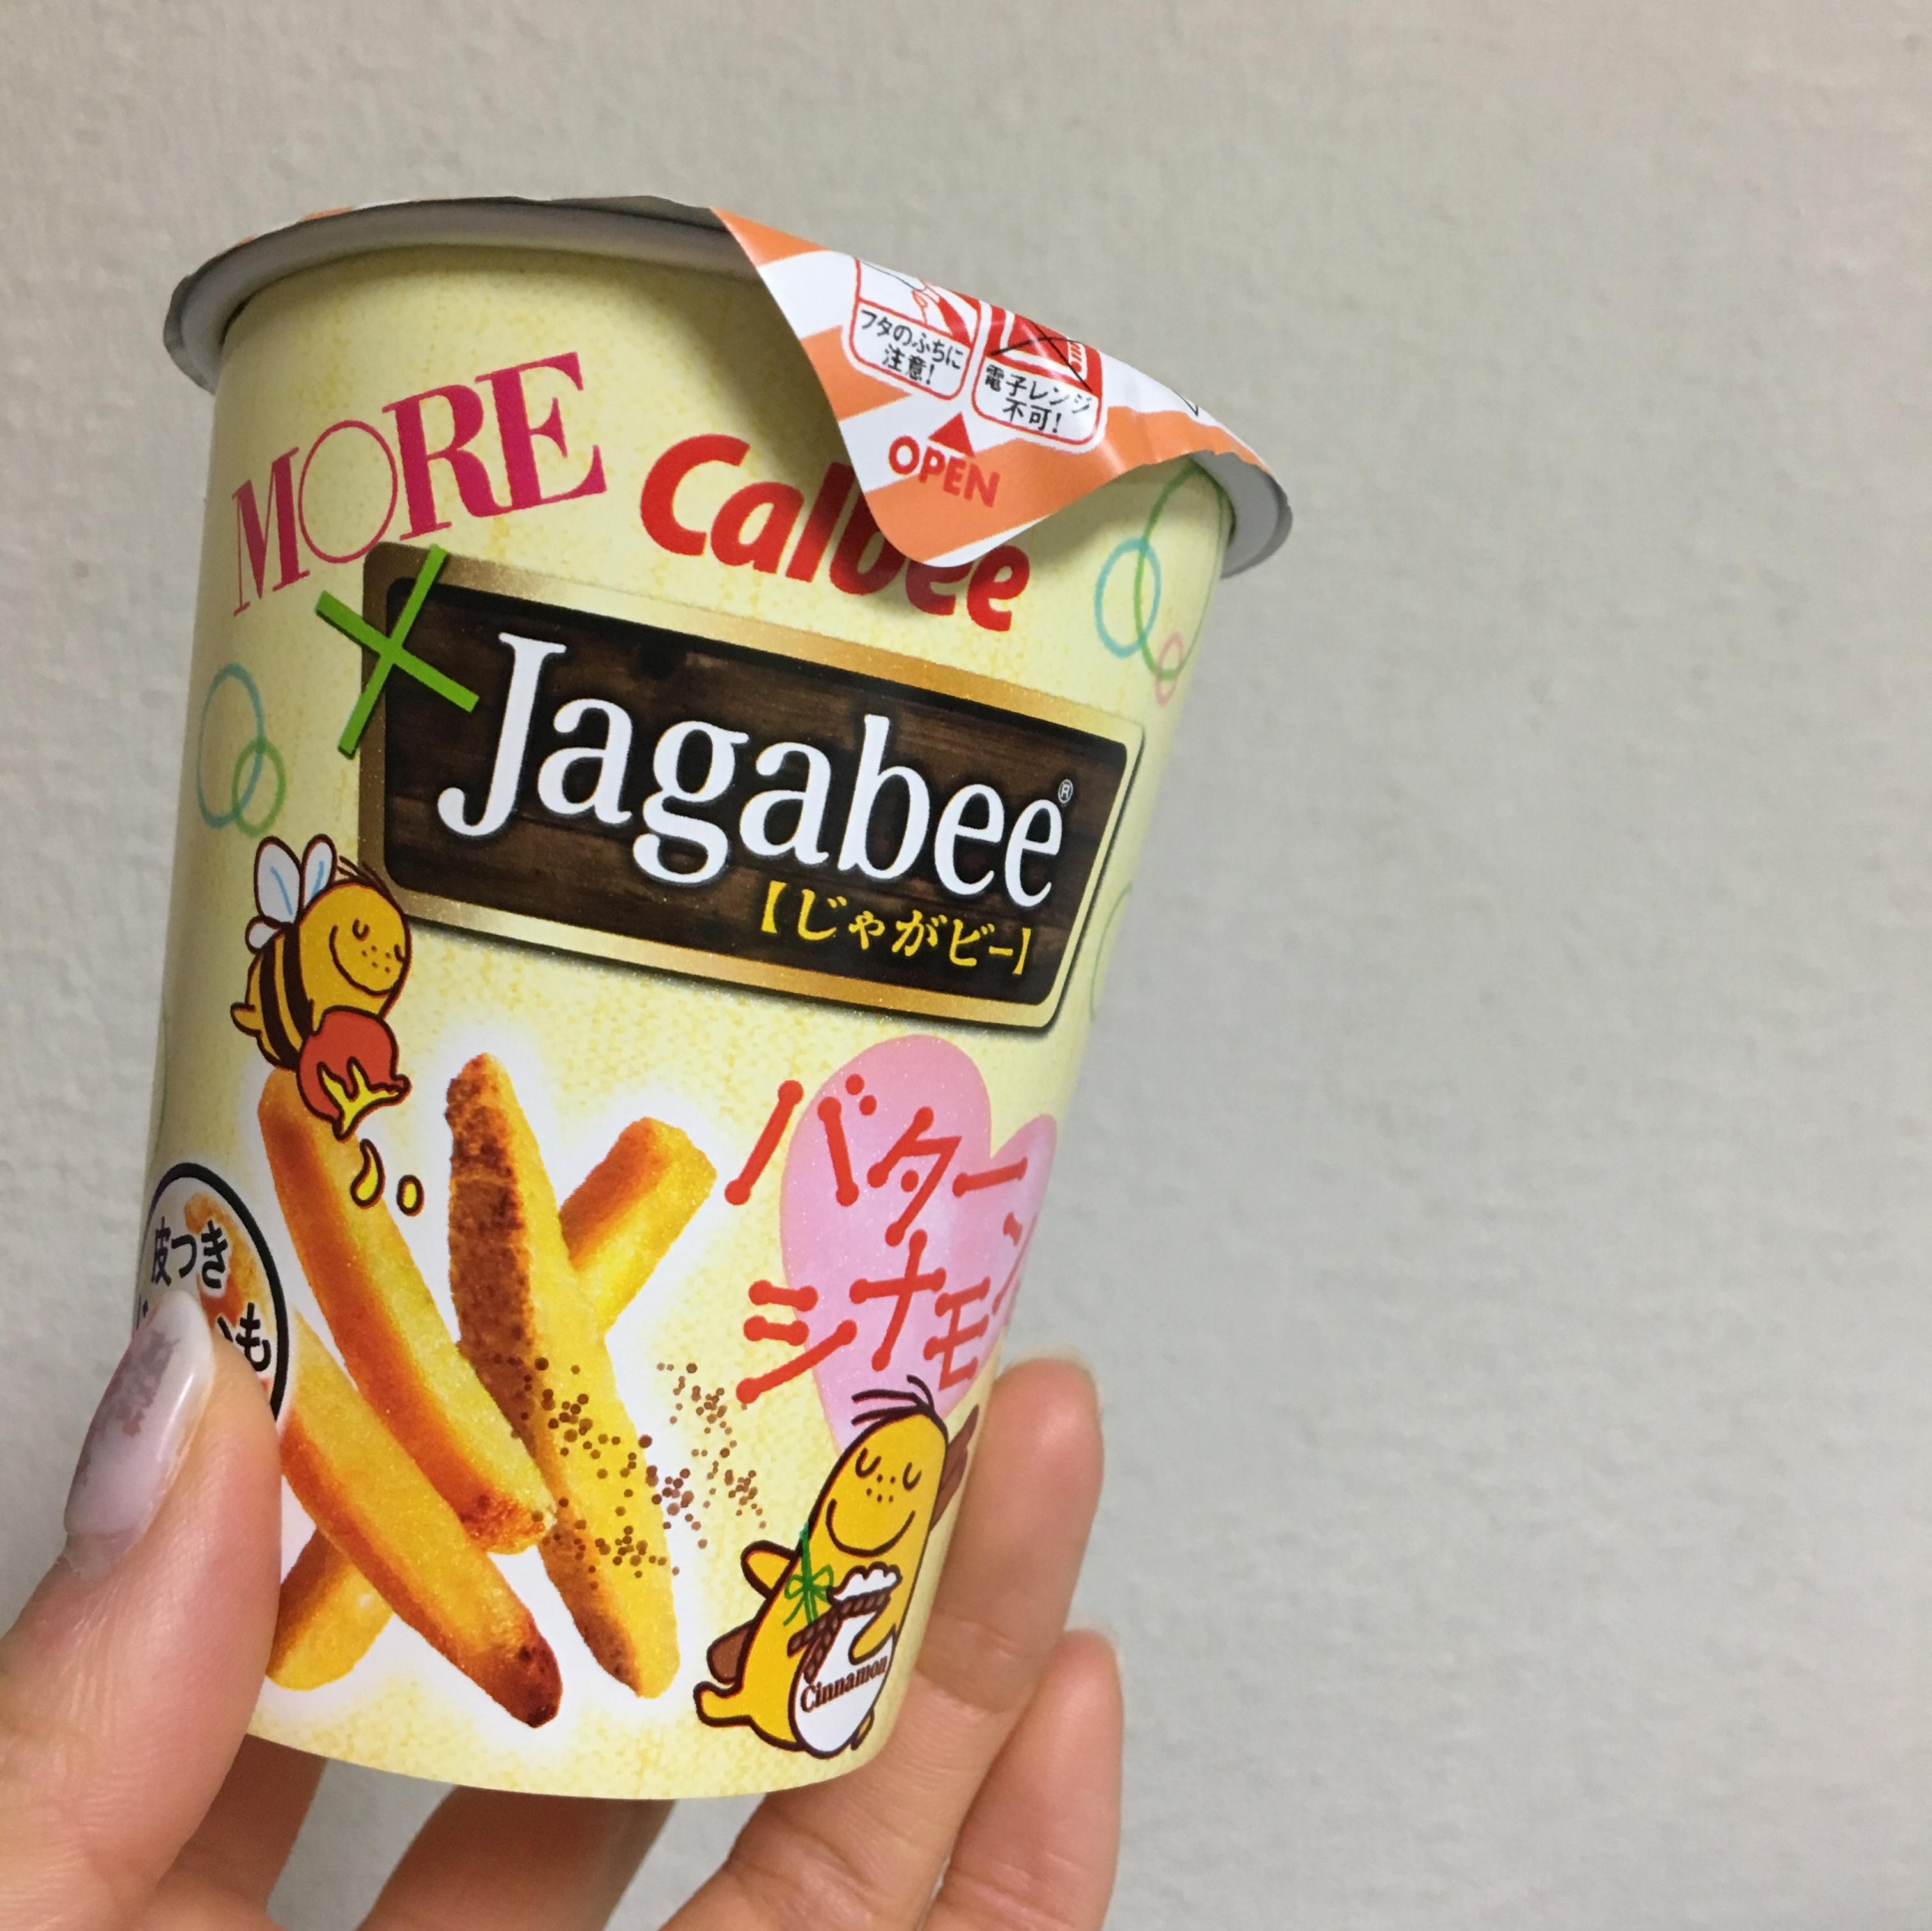 MORE×Jagabeeコラボ商品発売!スナック菓子が苦手な人にもおすすめ♡_1